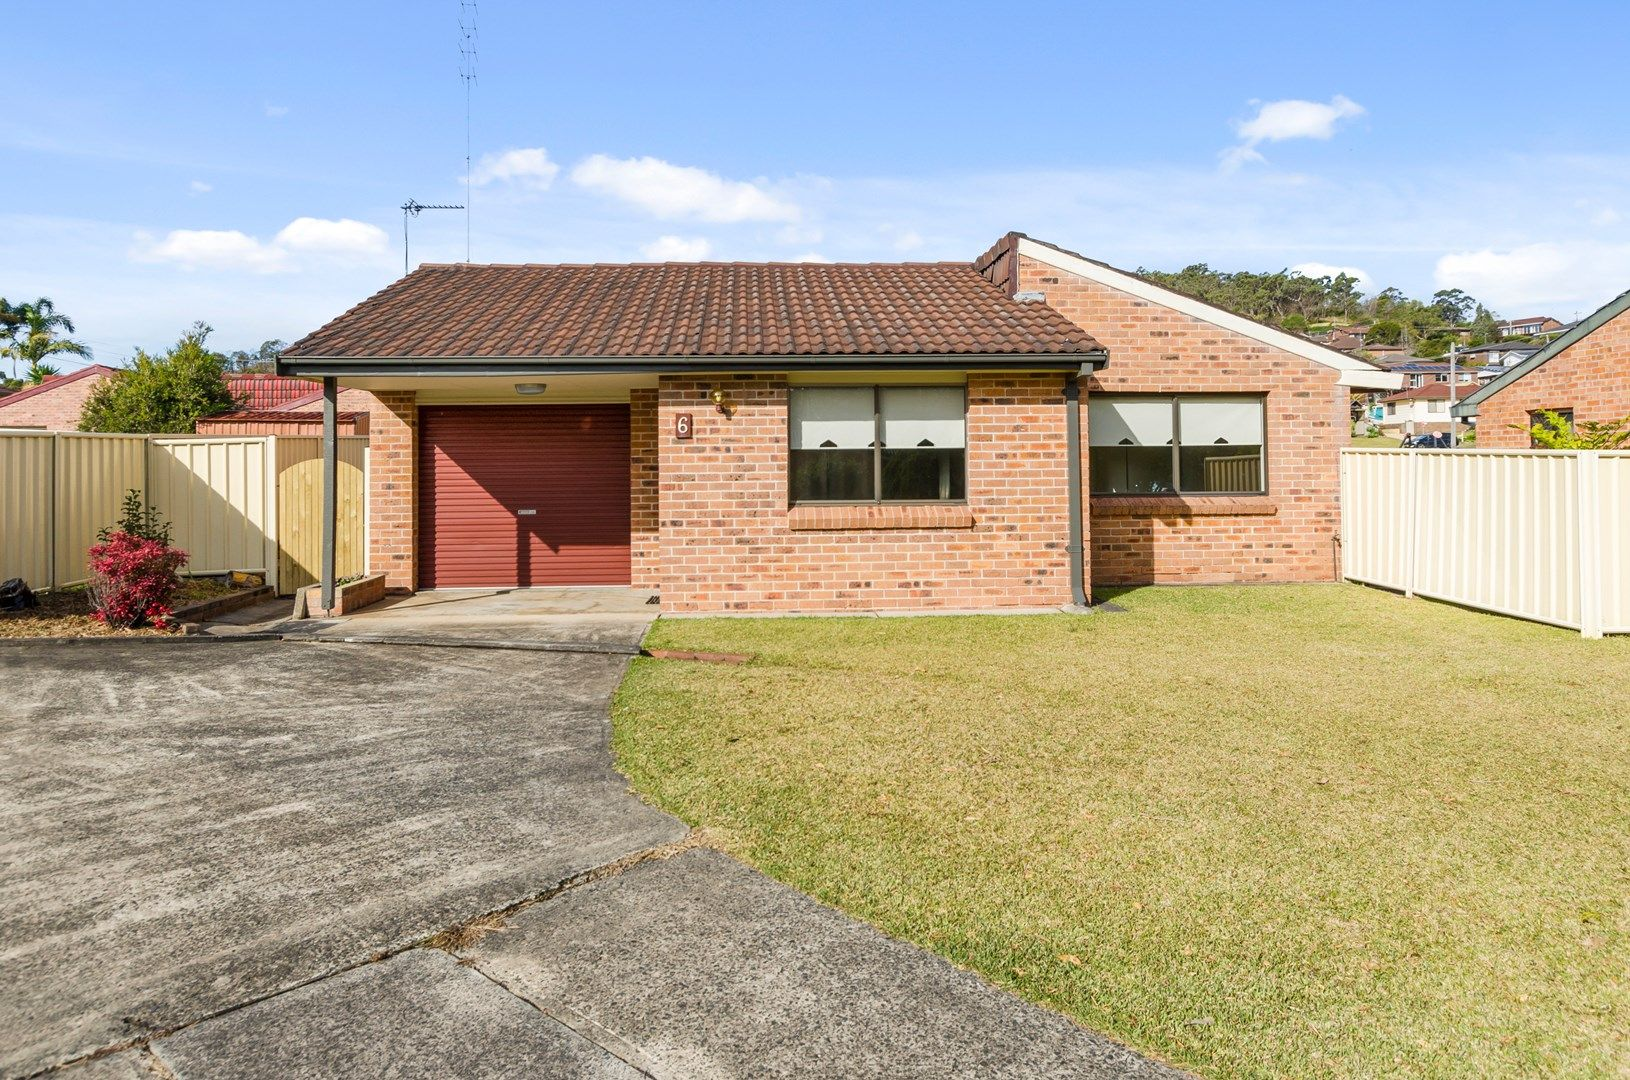 6/2-10 Compton St, Dapto NSW 2530, Image 0